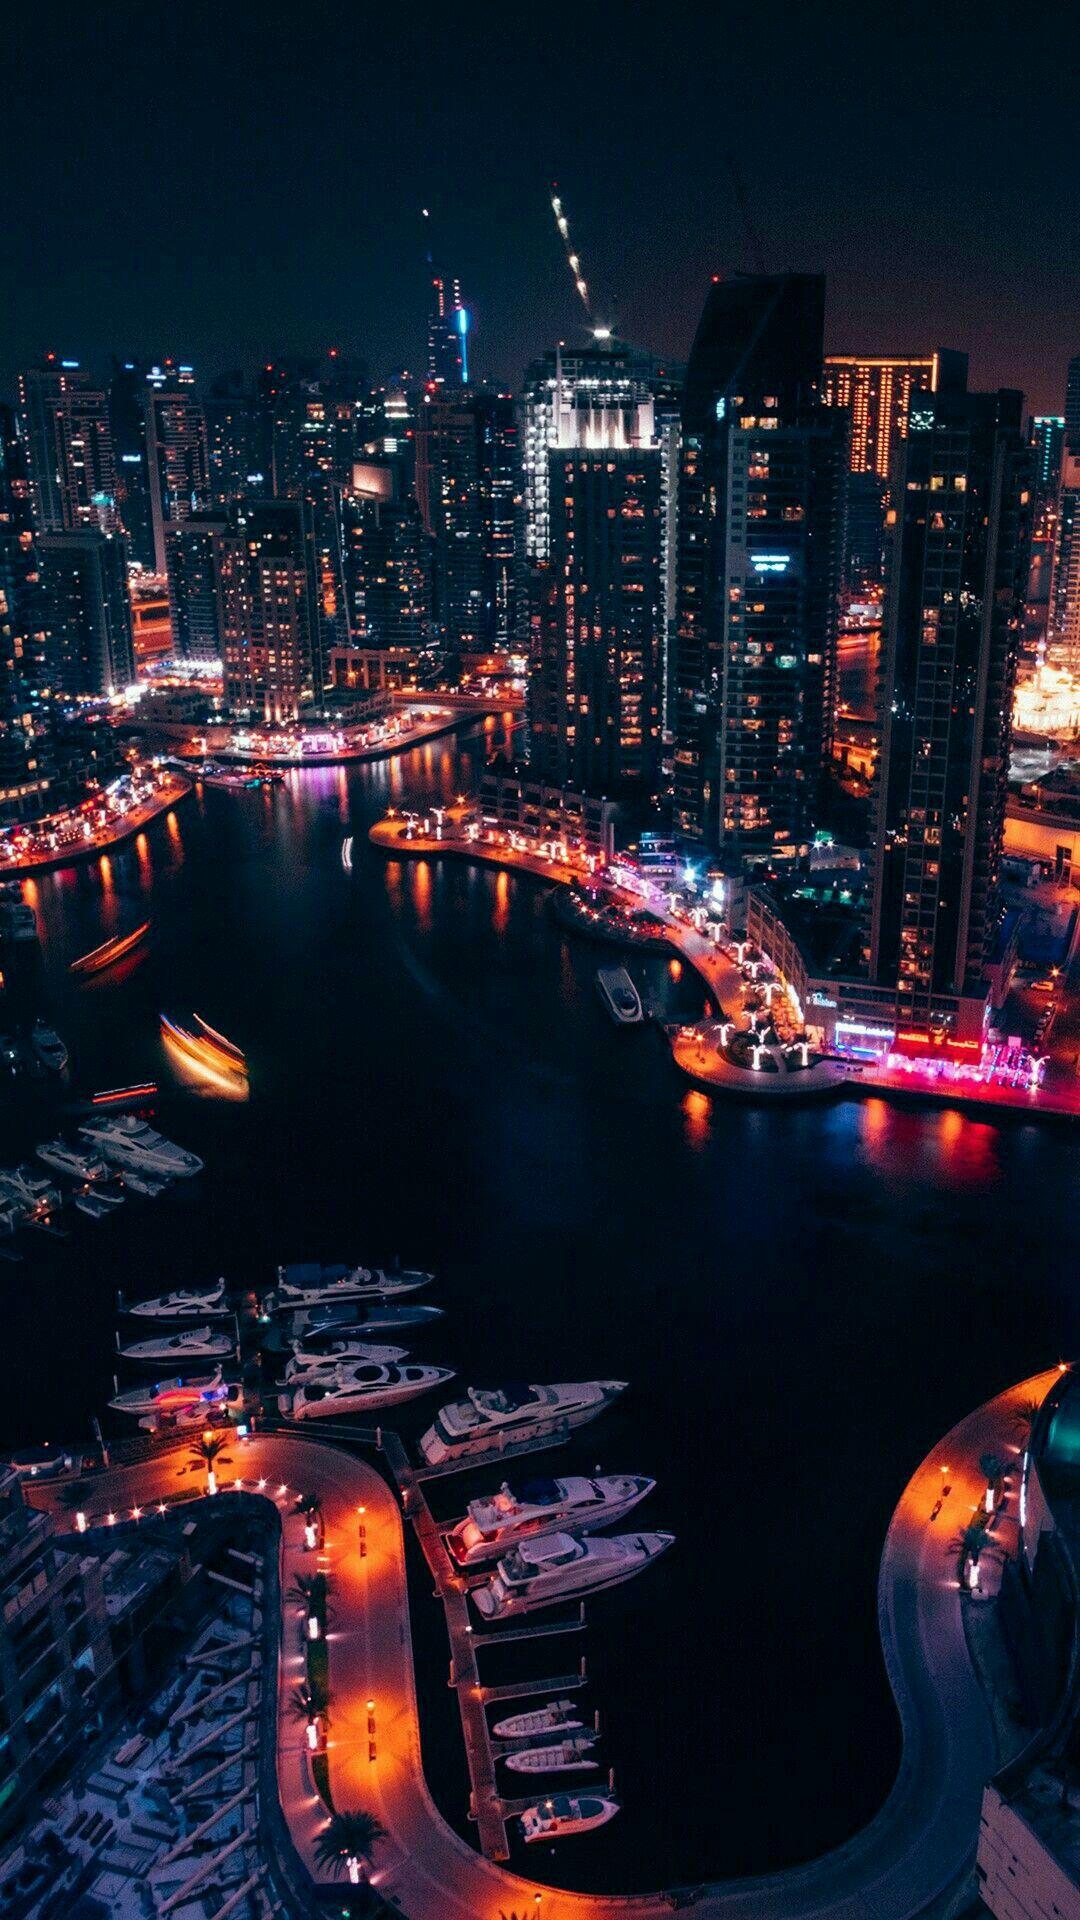 Still Aw4k3 City Wallpaper City Iphone Wallpaper City Photography Iphone night city lights wallpaper hd